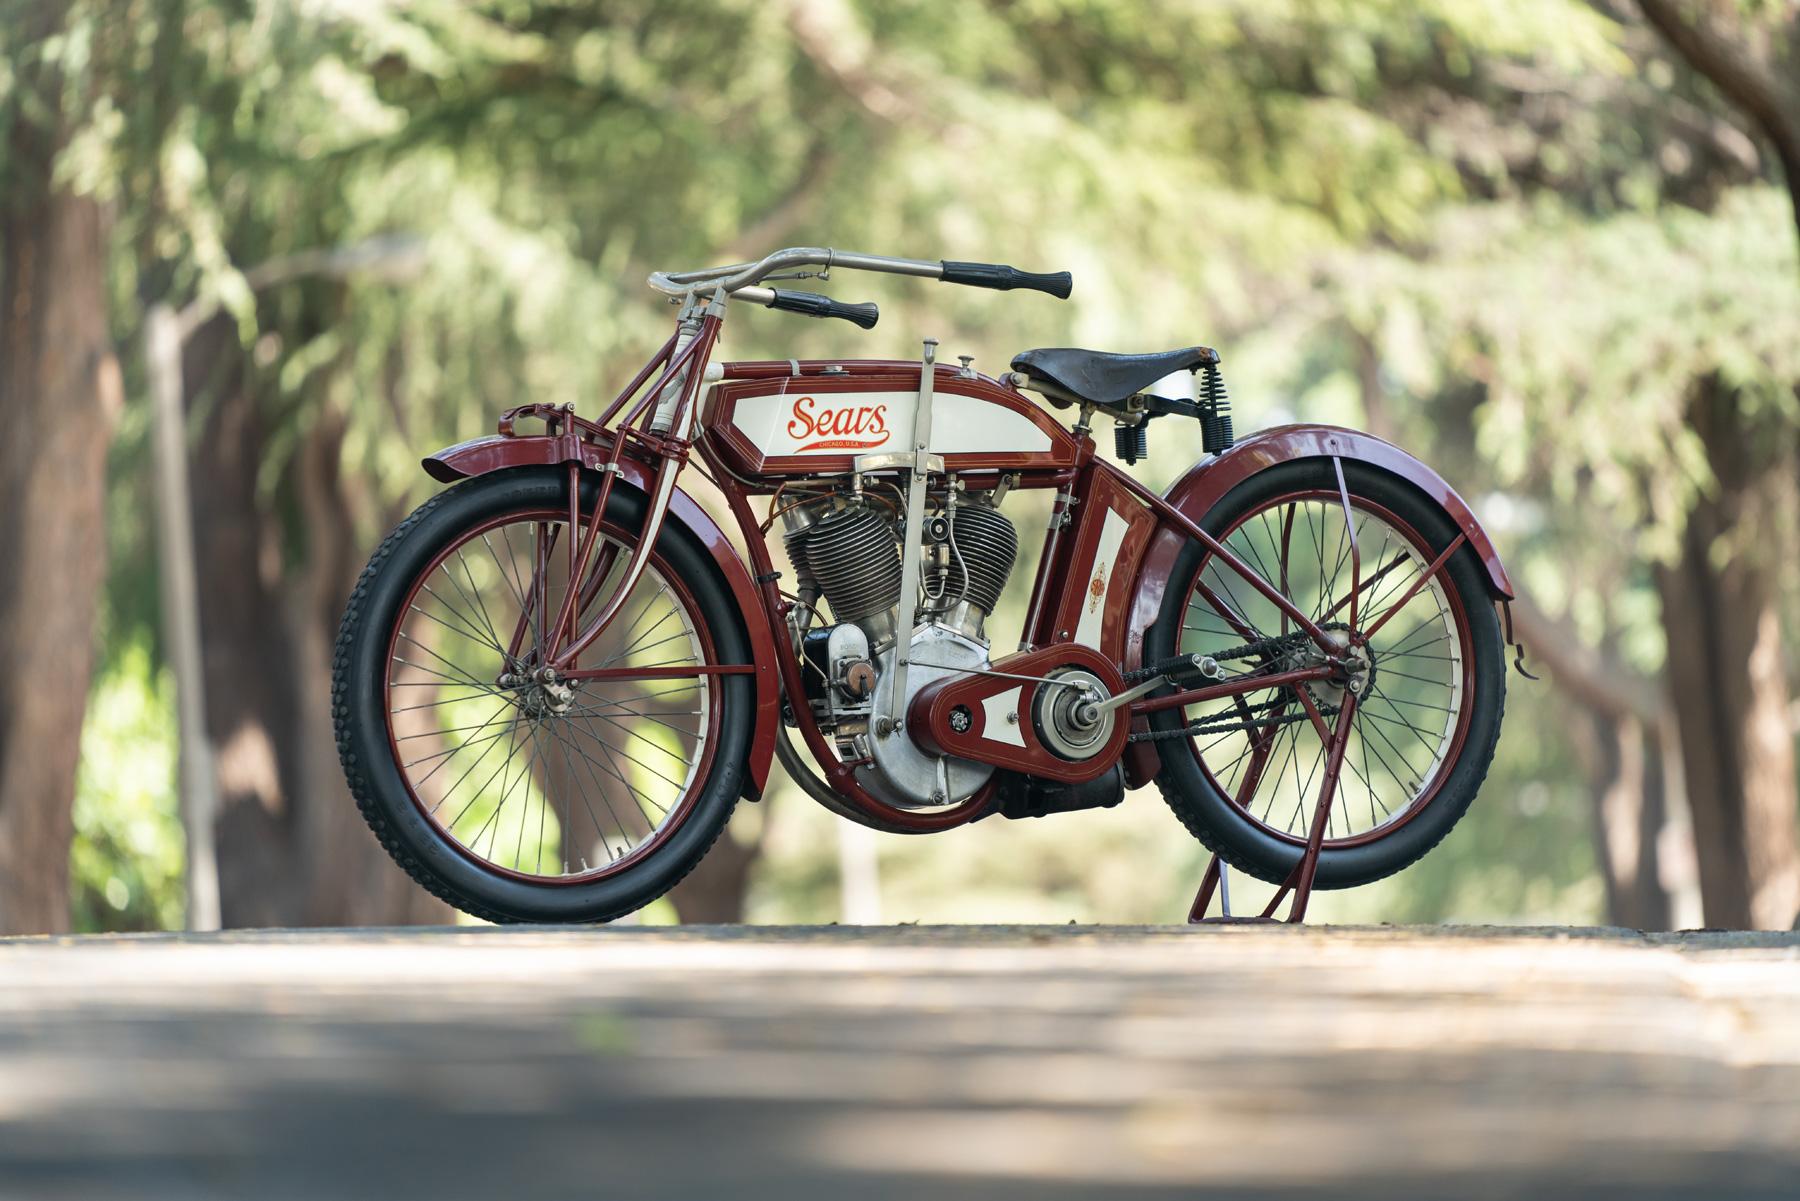 1912 Sears Dreadnaught V-twin